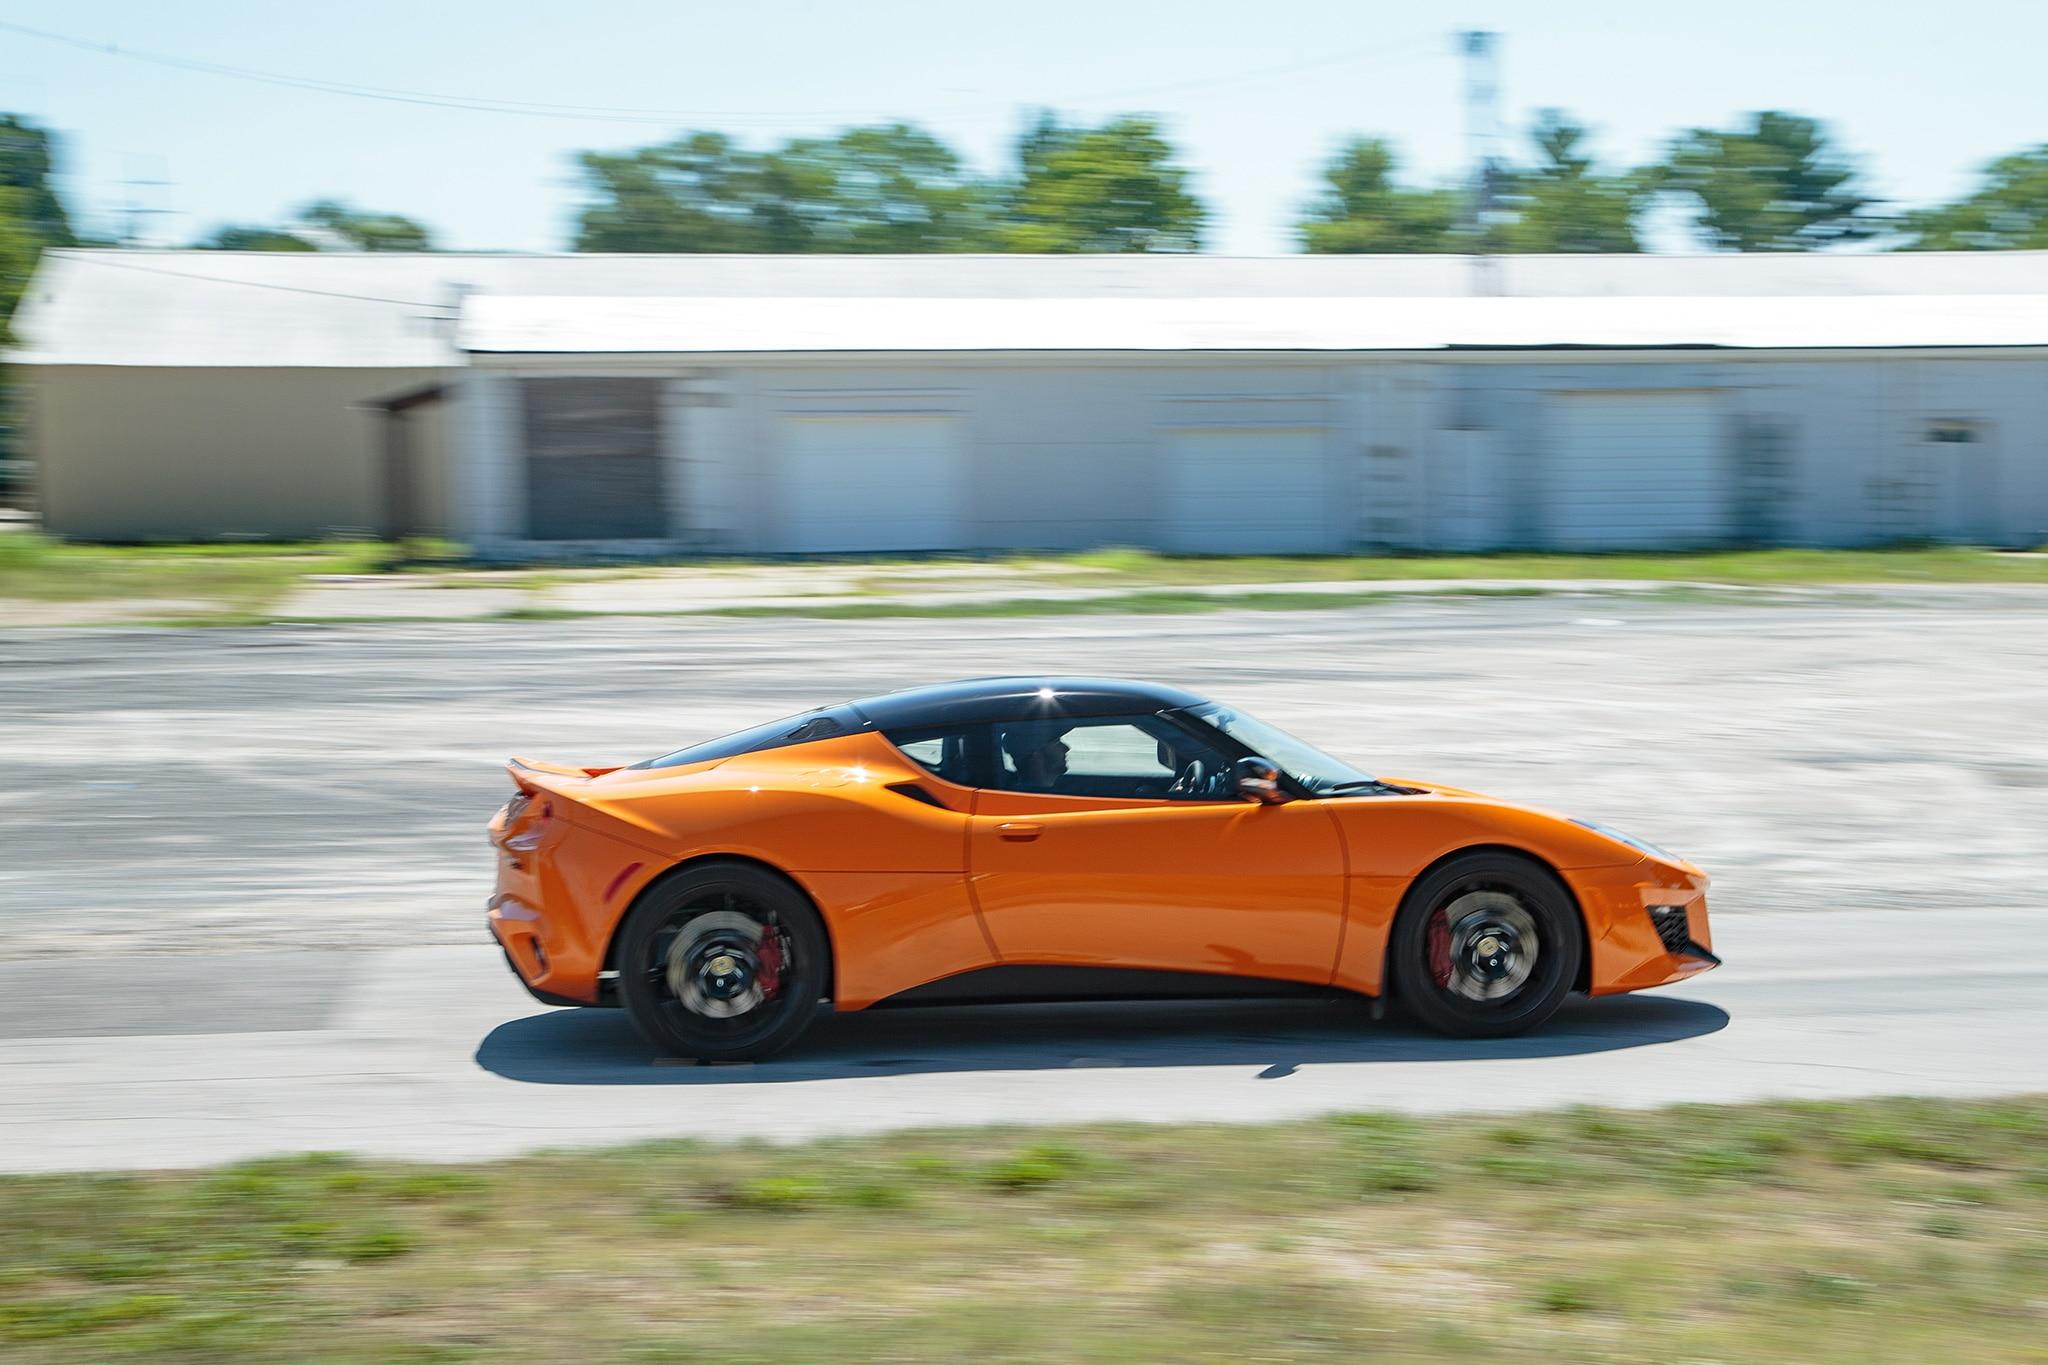 2017 Lotus Evora 400 Side Profile In Motion 05